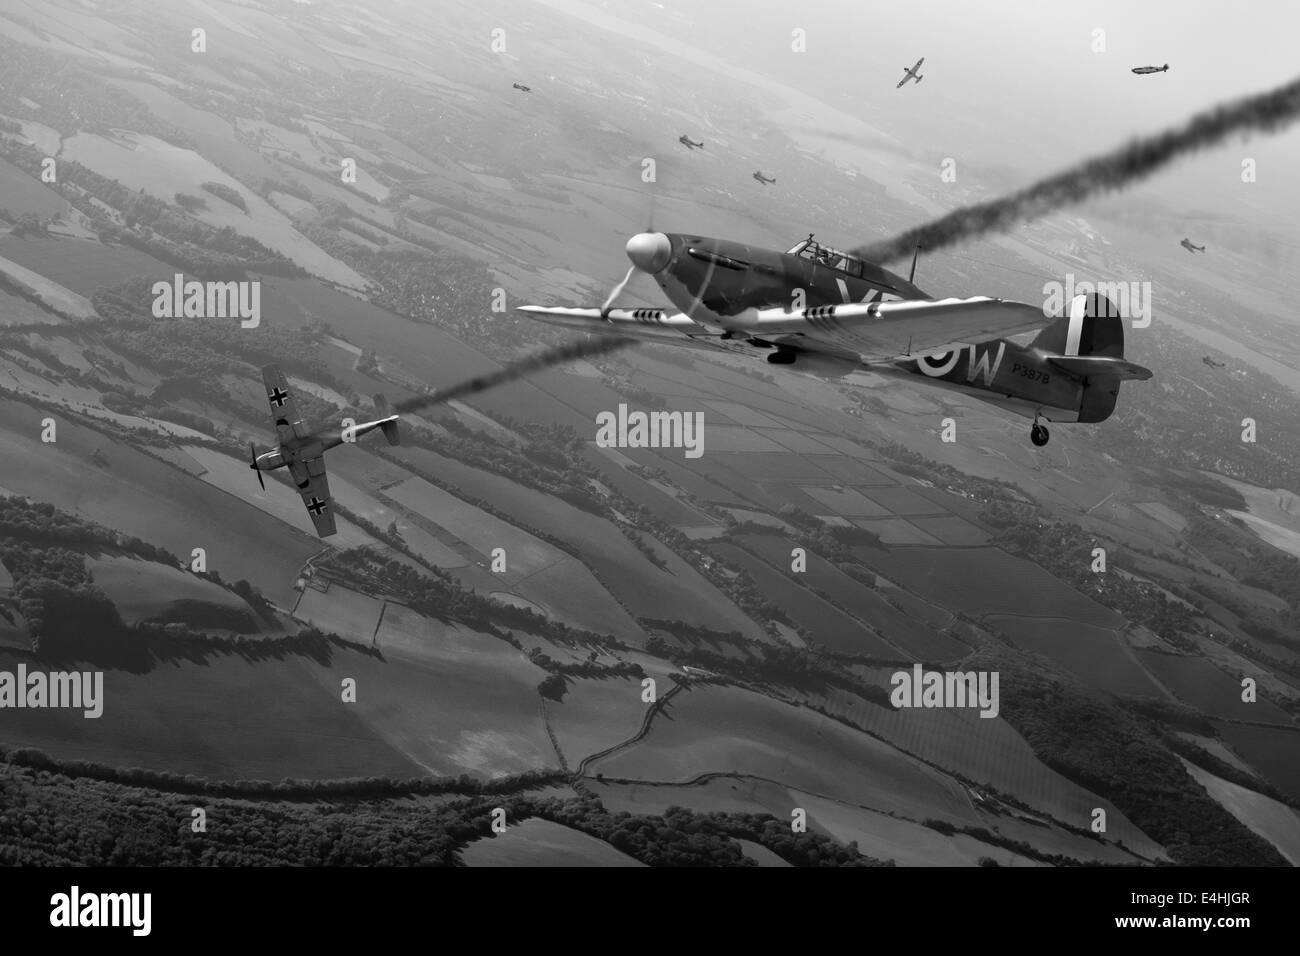 Battle of Britain aerial combat dogfight artwork showing RAF Hawker Hurricane shooting down a Luftwaffe Messerschmitt - Stock Image